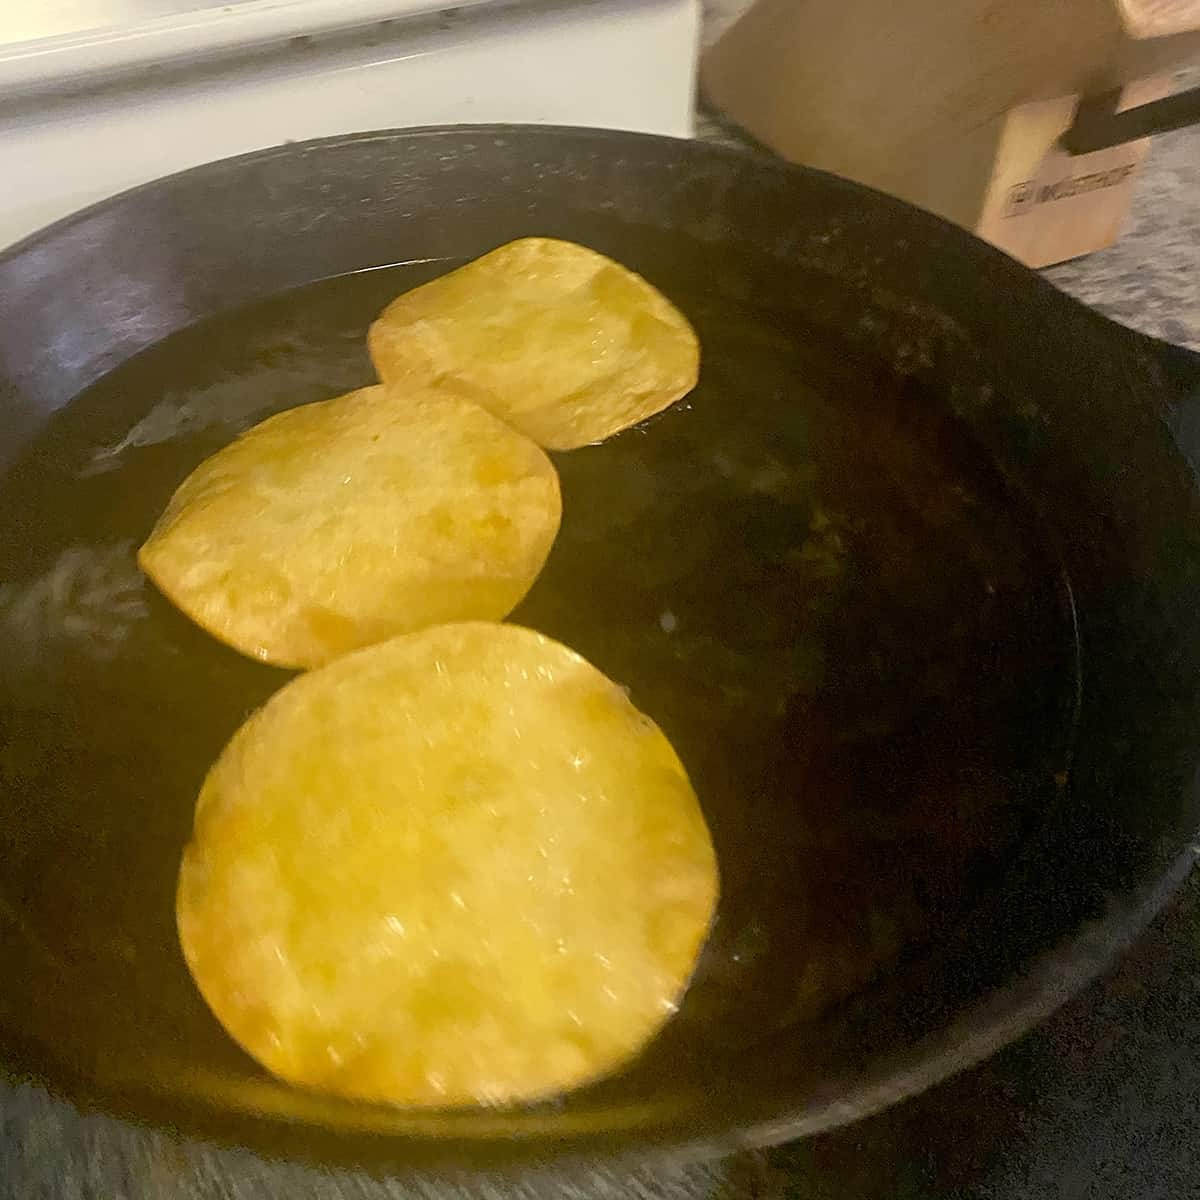 Three corn tortillas frying in hot oil in a cast iron pan.